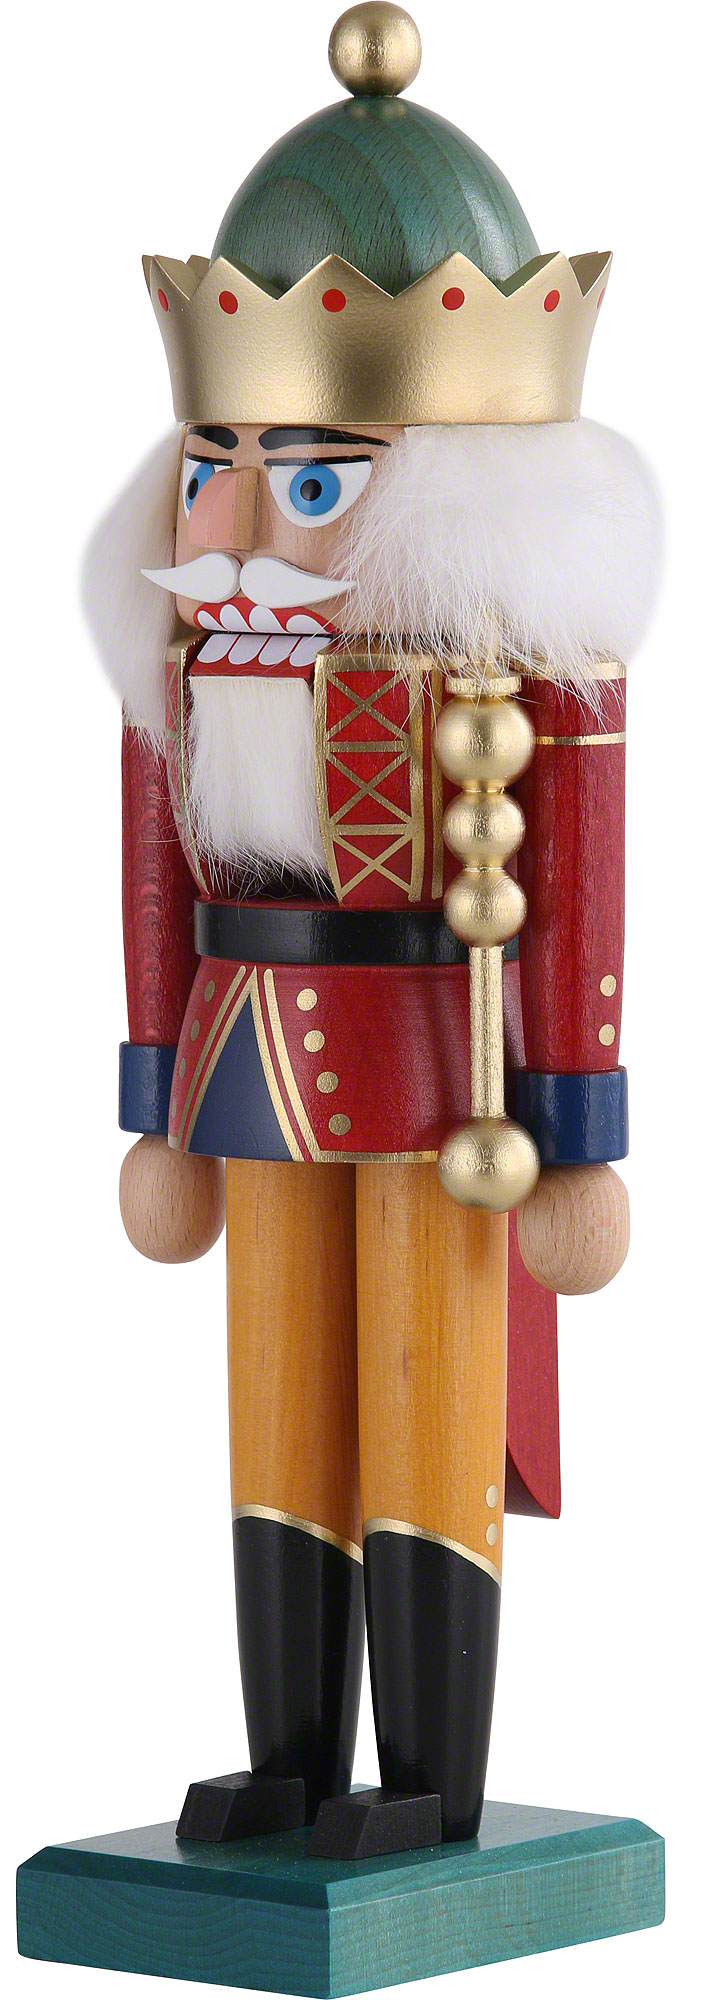 Crown King Az >> Nutcracker - King with Crown (29 cm/11in) by KWO